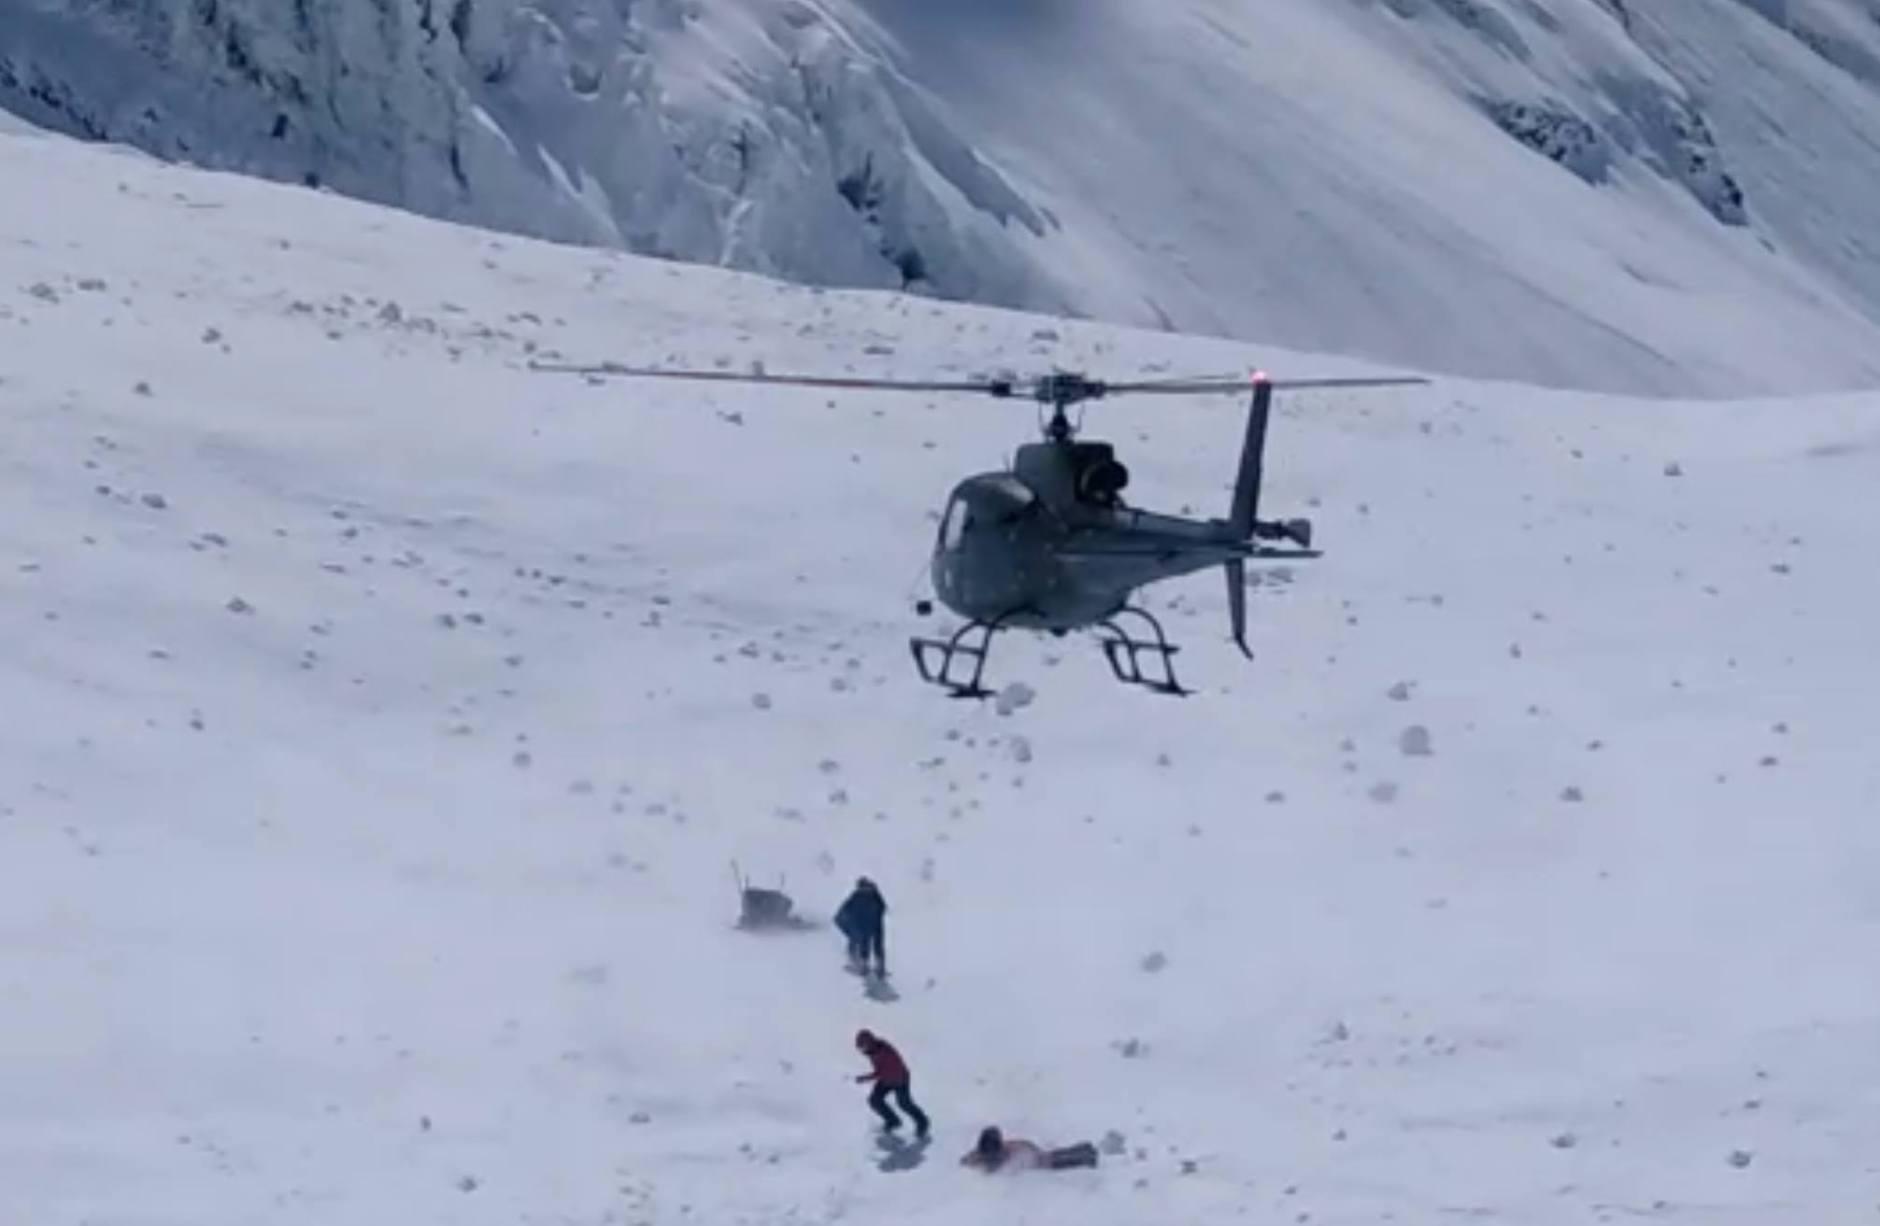 alpinismo, nanga parbat, daniele nardi, tom ballard, alex txikon